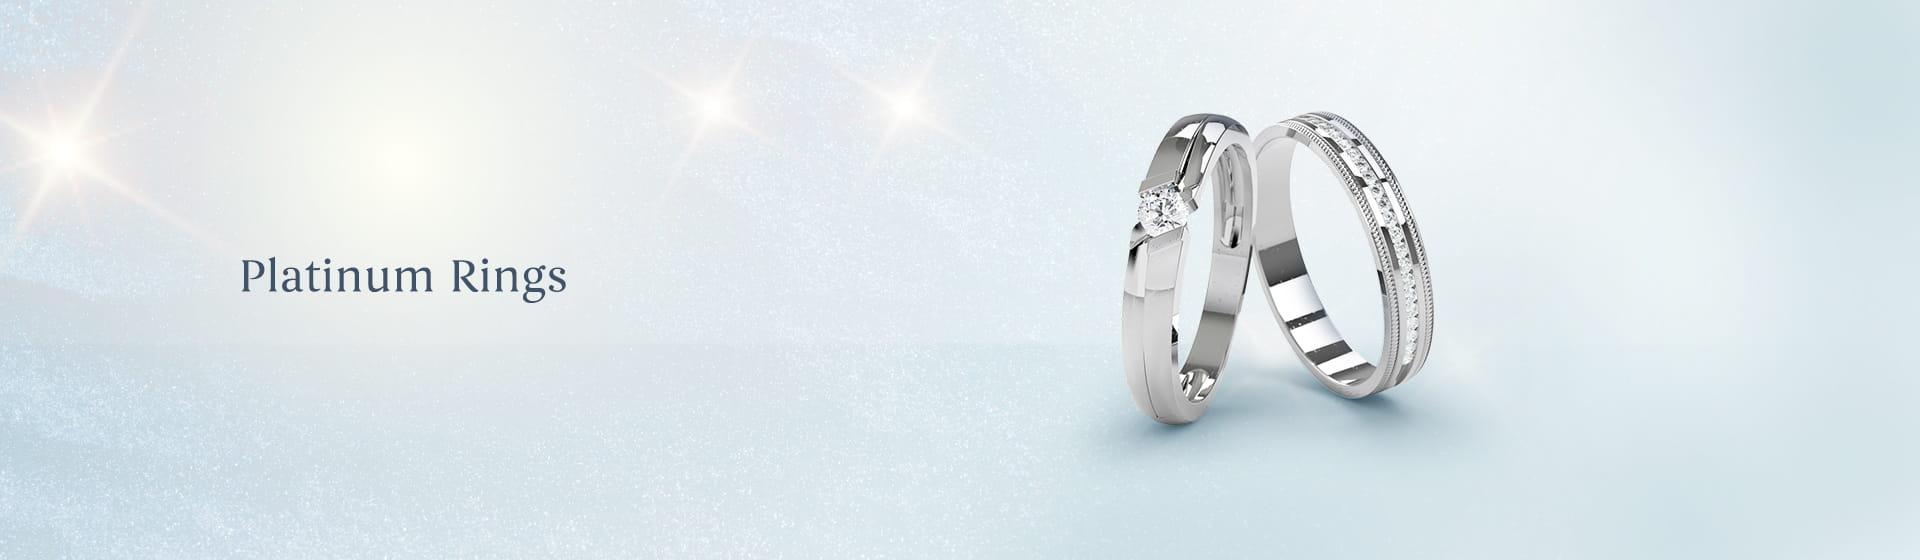 Daily wear platinum engagement Rings for women & men